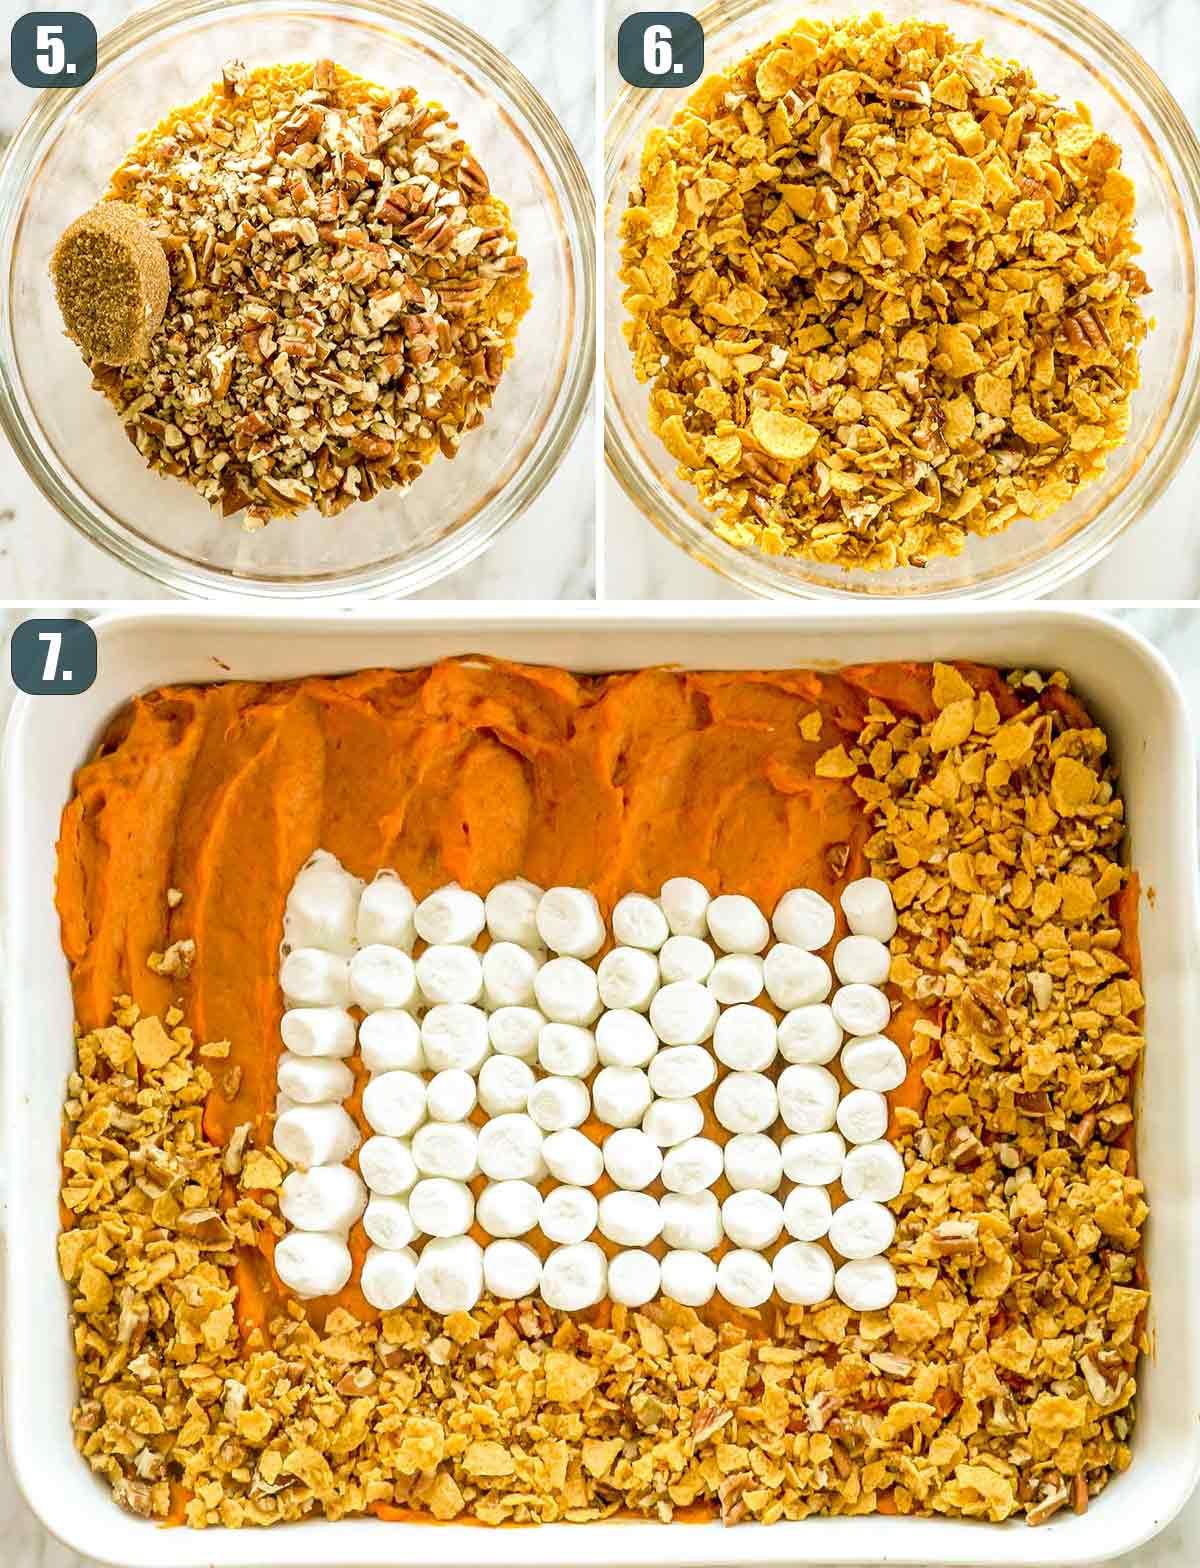 process shots showing how to finish making sweet potato casserole.